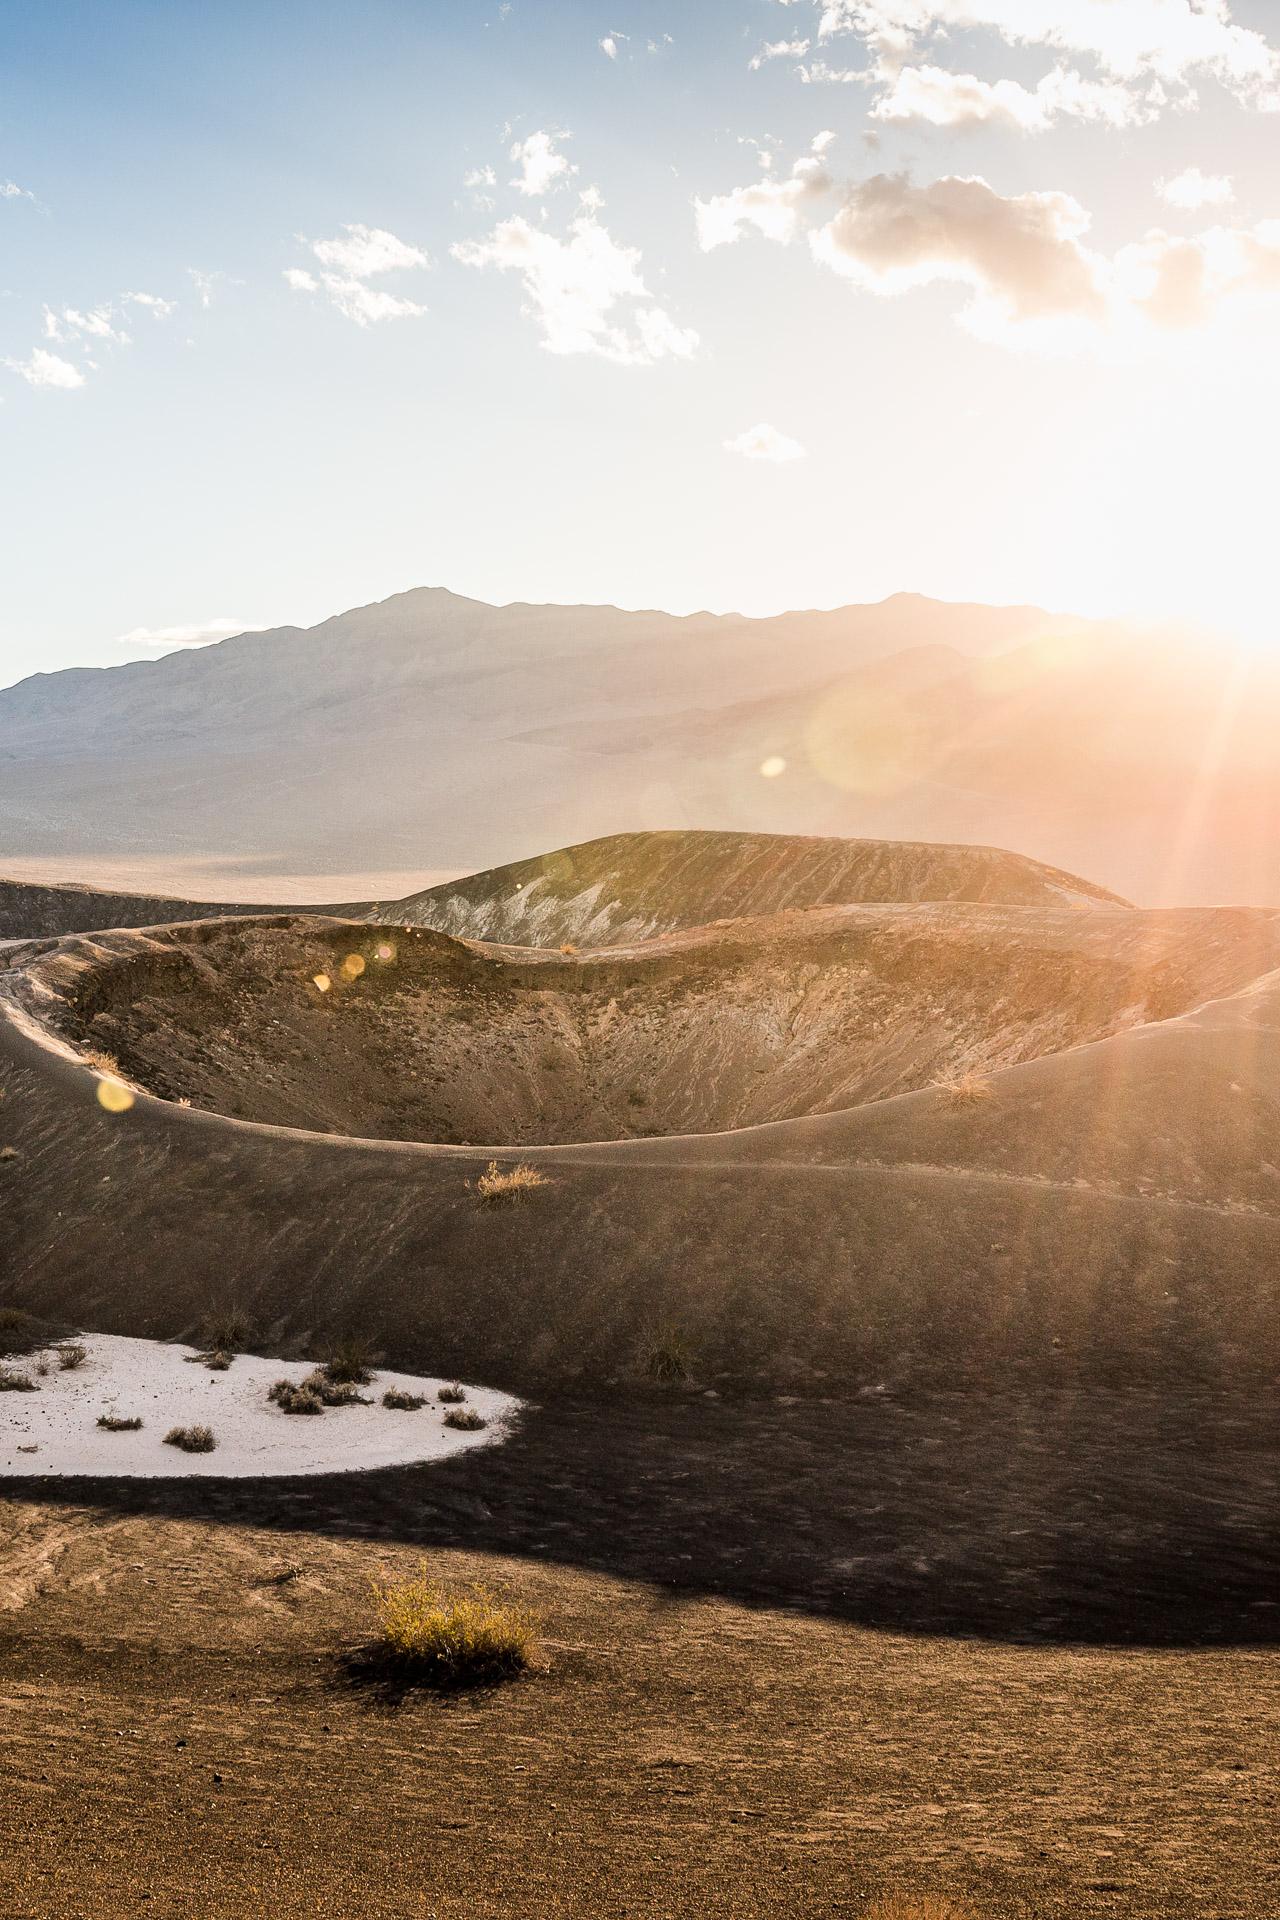 Northwest-America-Death-Valley-USA-2016-_MG_8284-2